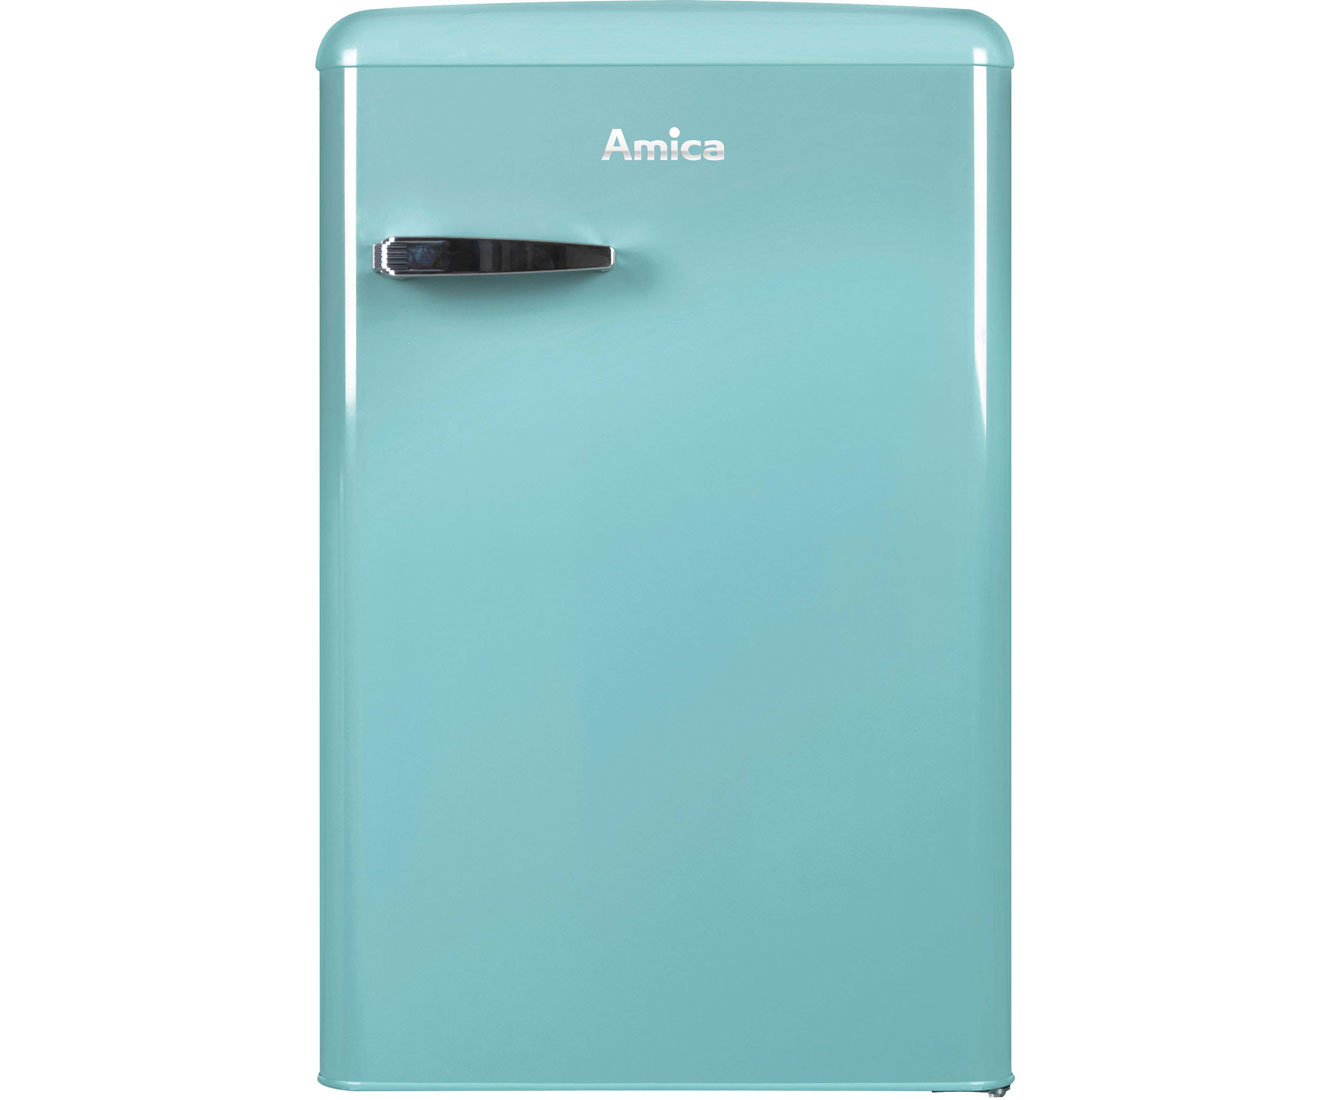 Amica Kühlschrank Retro Türkis : Amica ks t retro design kühlschrank freistehend cm